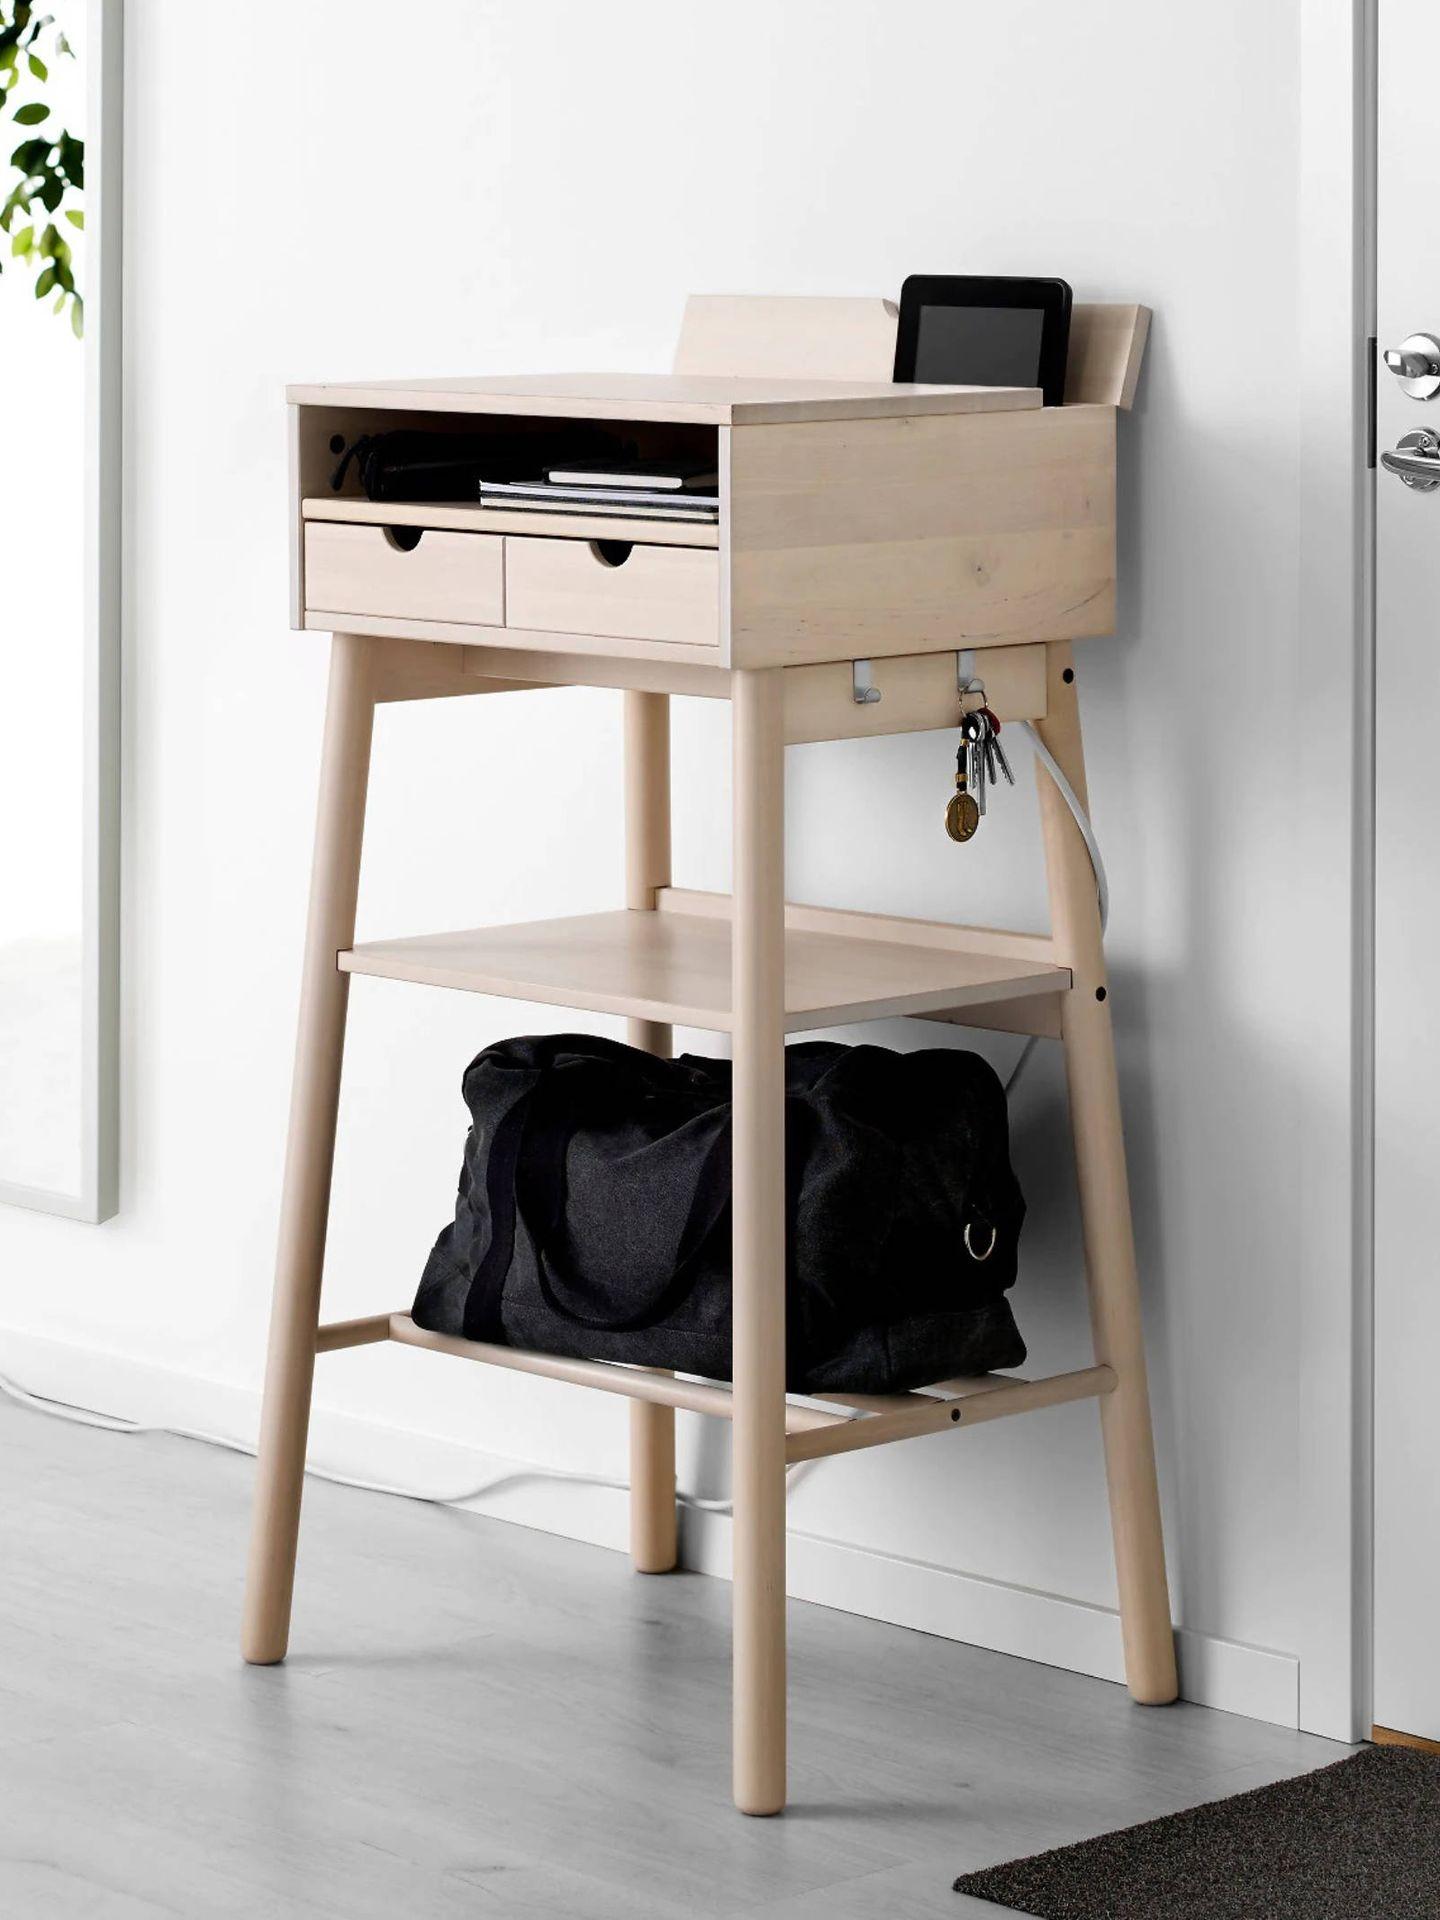 Escritorio multiusos de Ikea. (Cortesía)